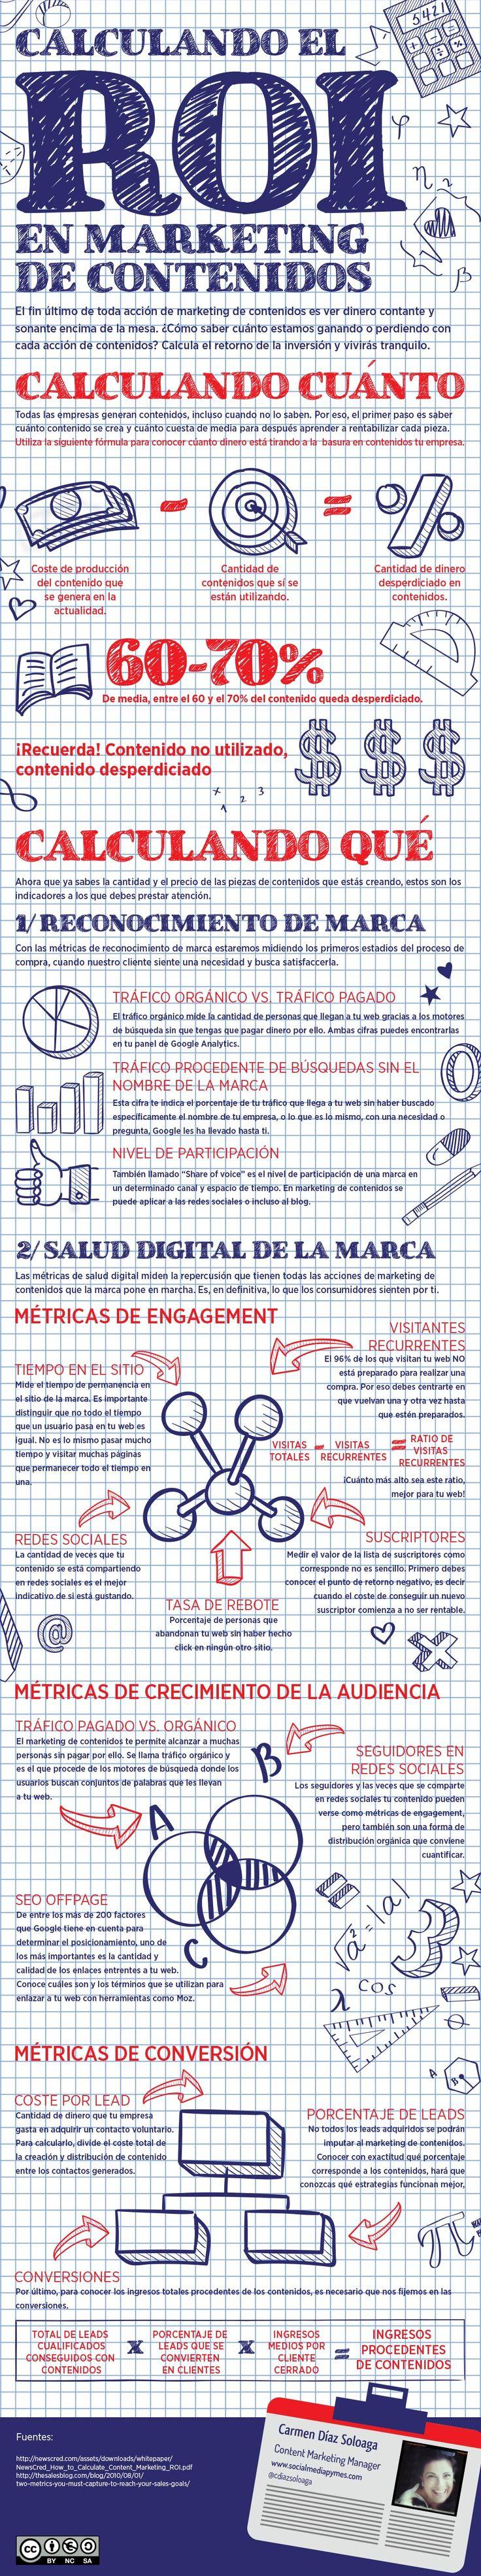 Calcula el ROI en marketing de contenidos  #infografia #infographic #marketing